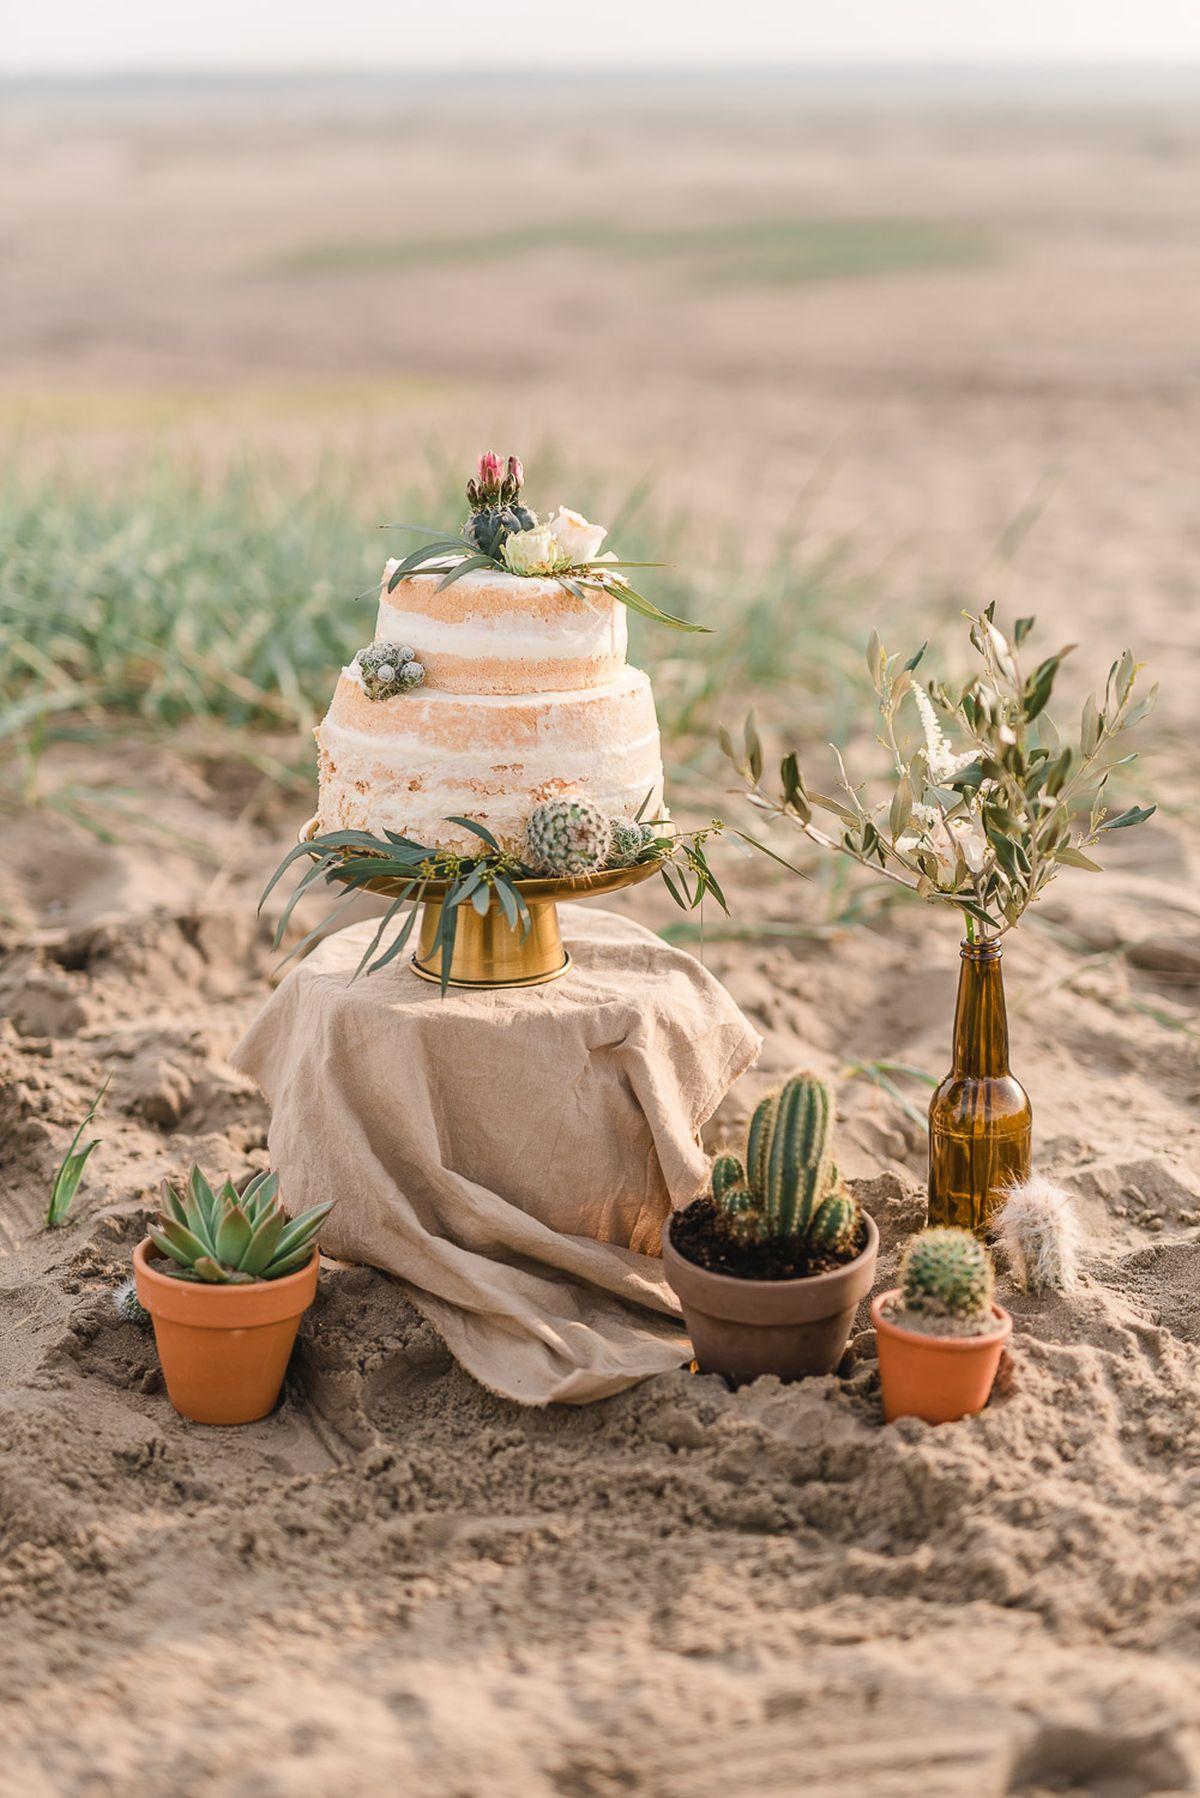 aschaaa-photography-wedding-shoot-wüste (90)